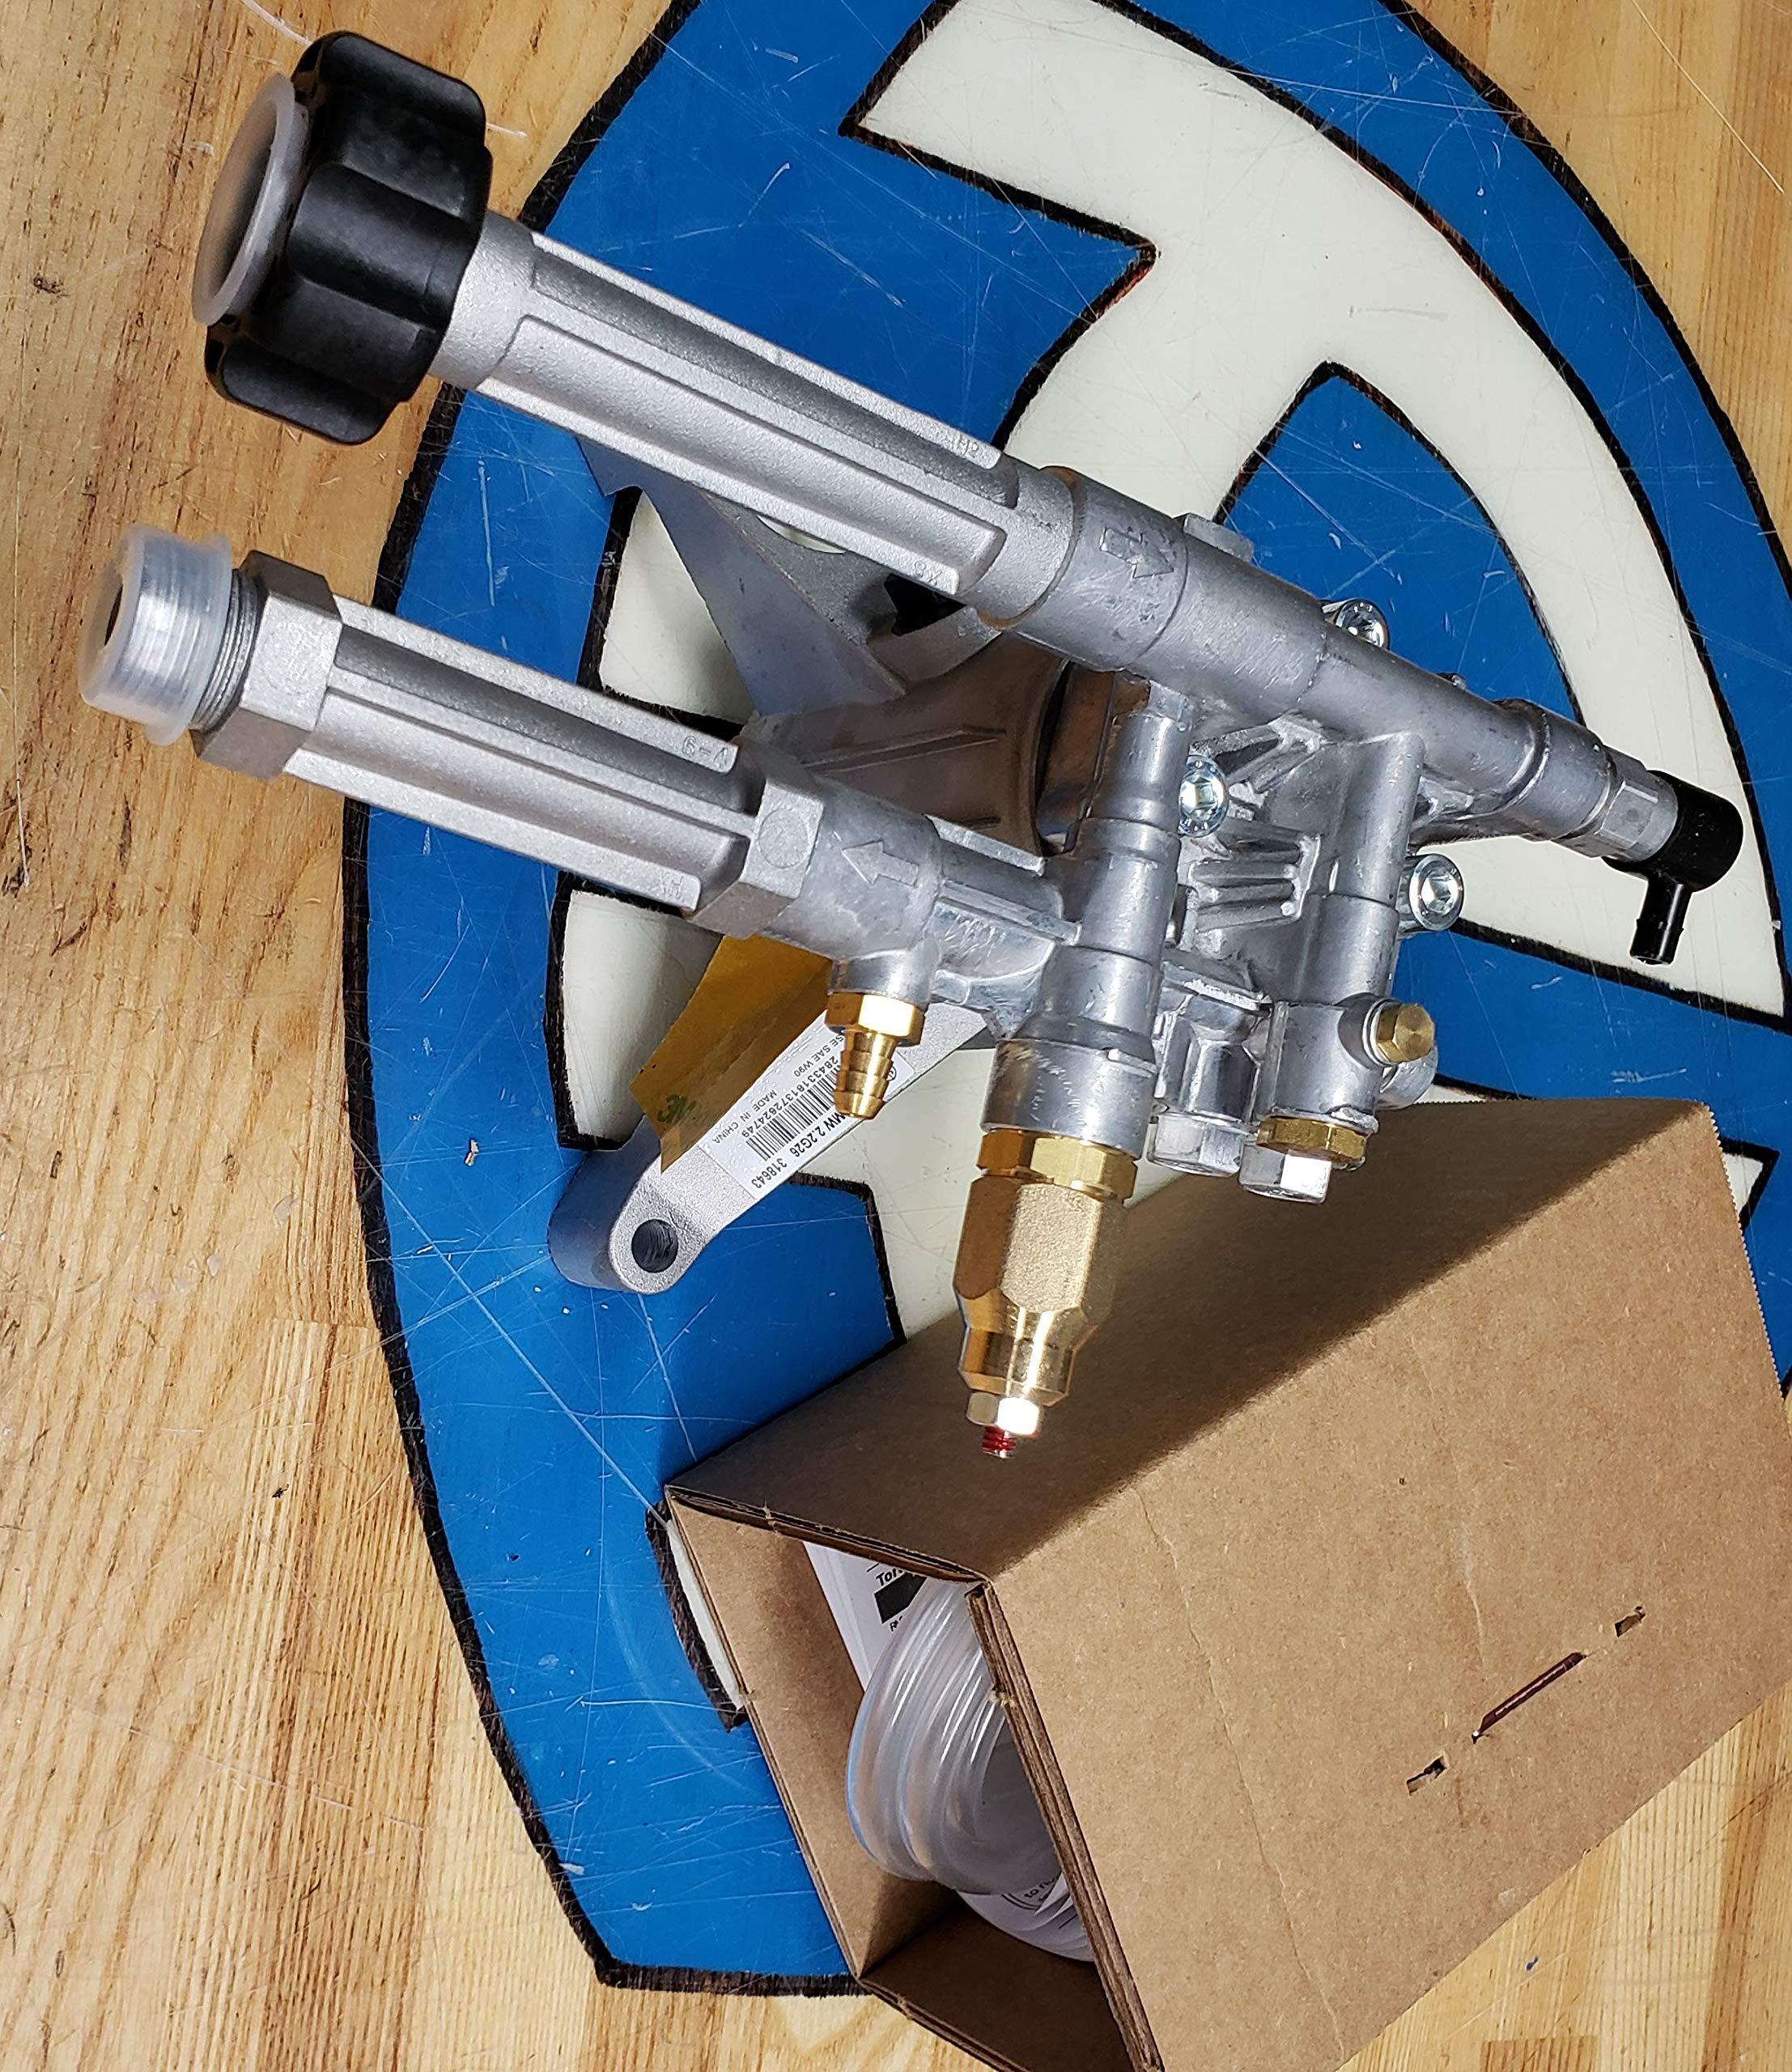 Annovi Reverberi SRMW22G26-SX AR Rotated Shaft Pump Kit, Detergent Tube with Filter, Natural